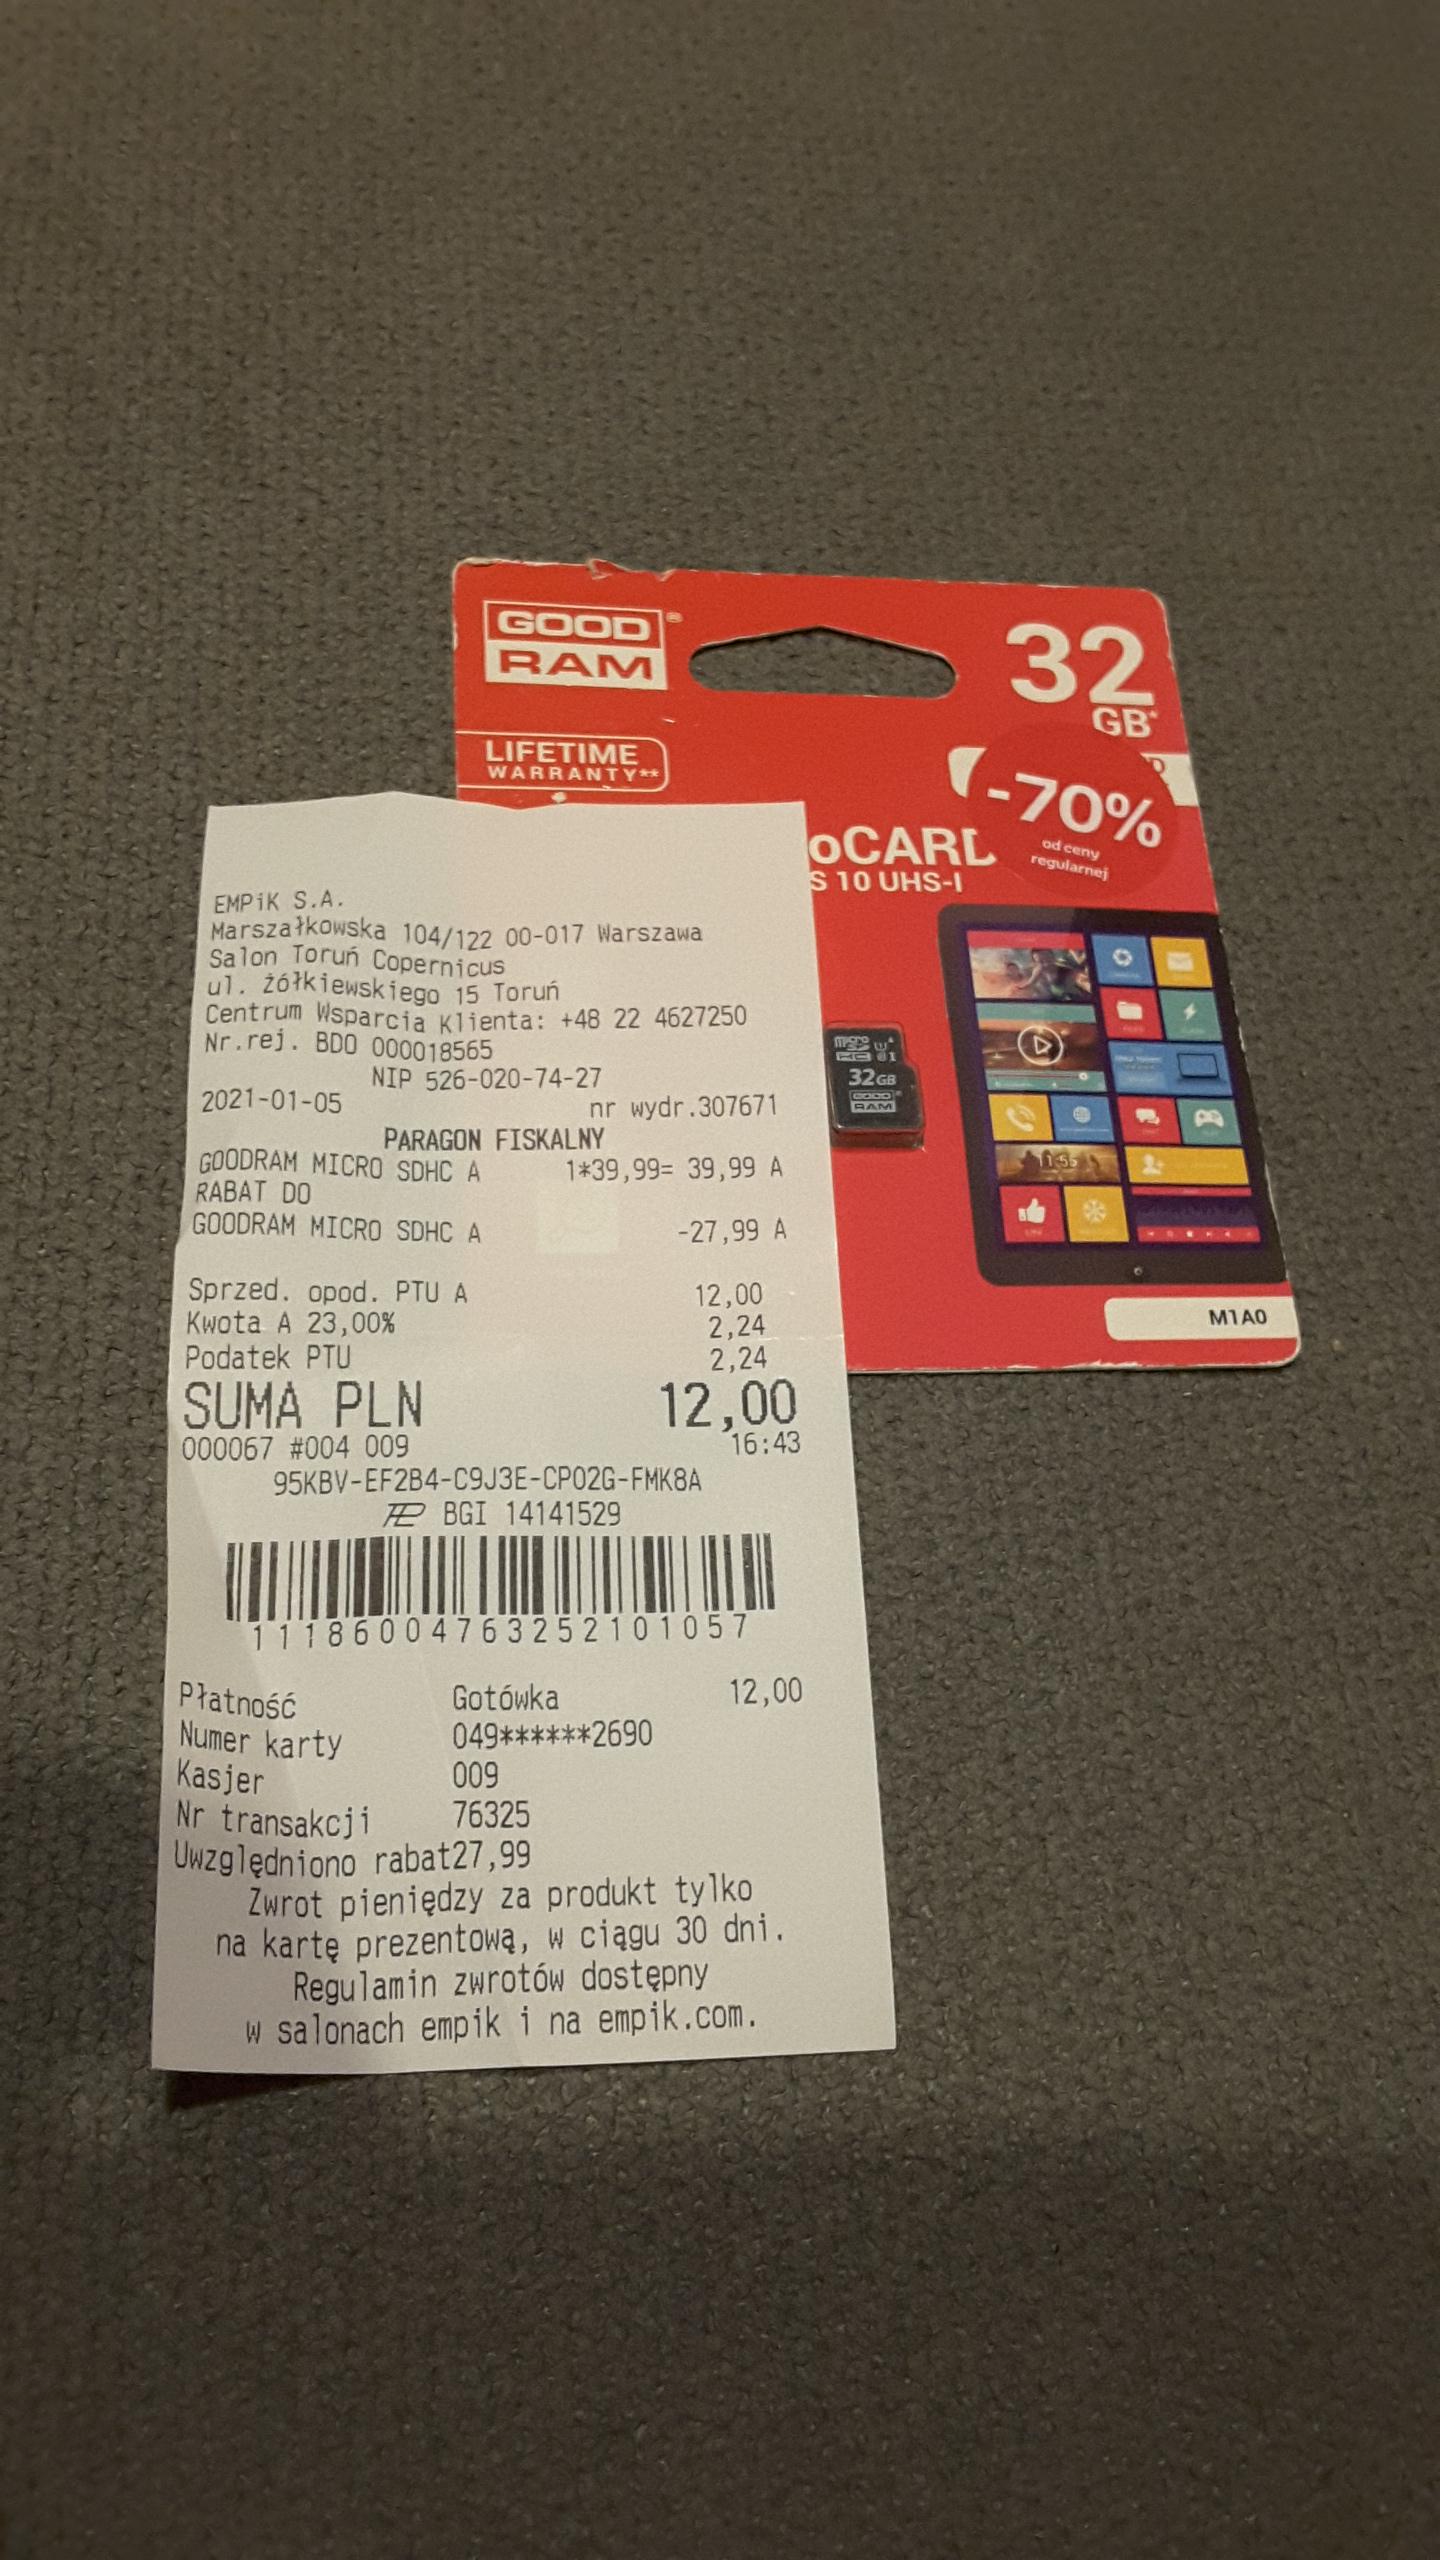 Karta pamięci MicroSd 32 GB GoodRam w Empik